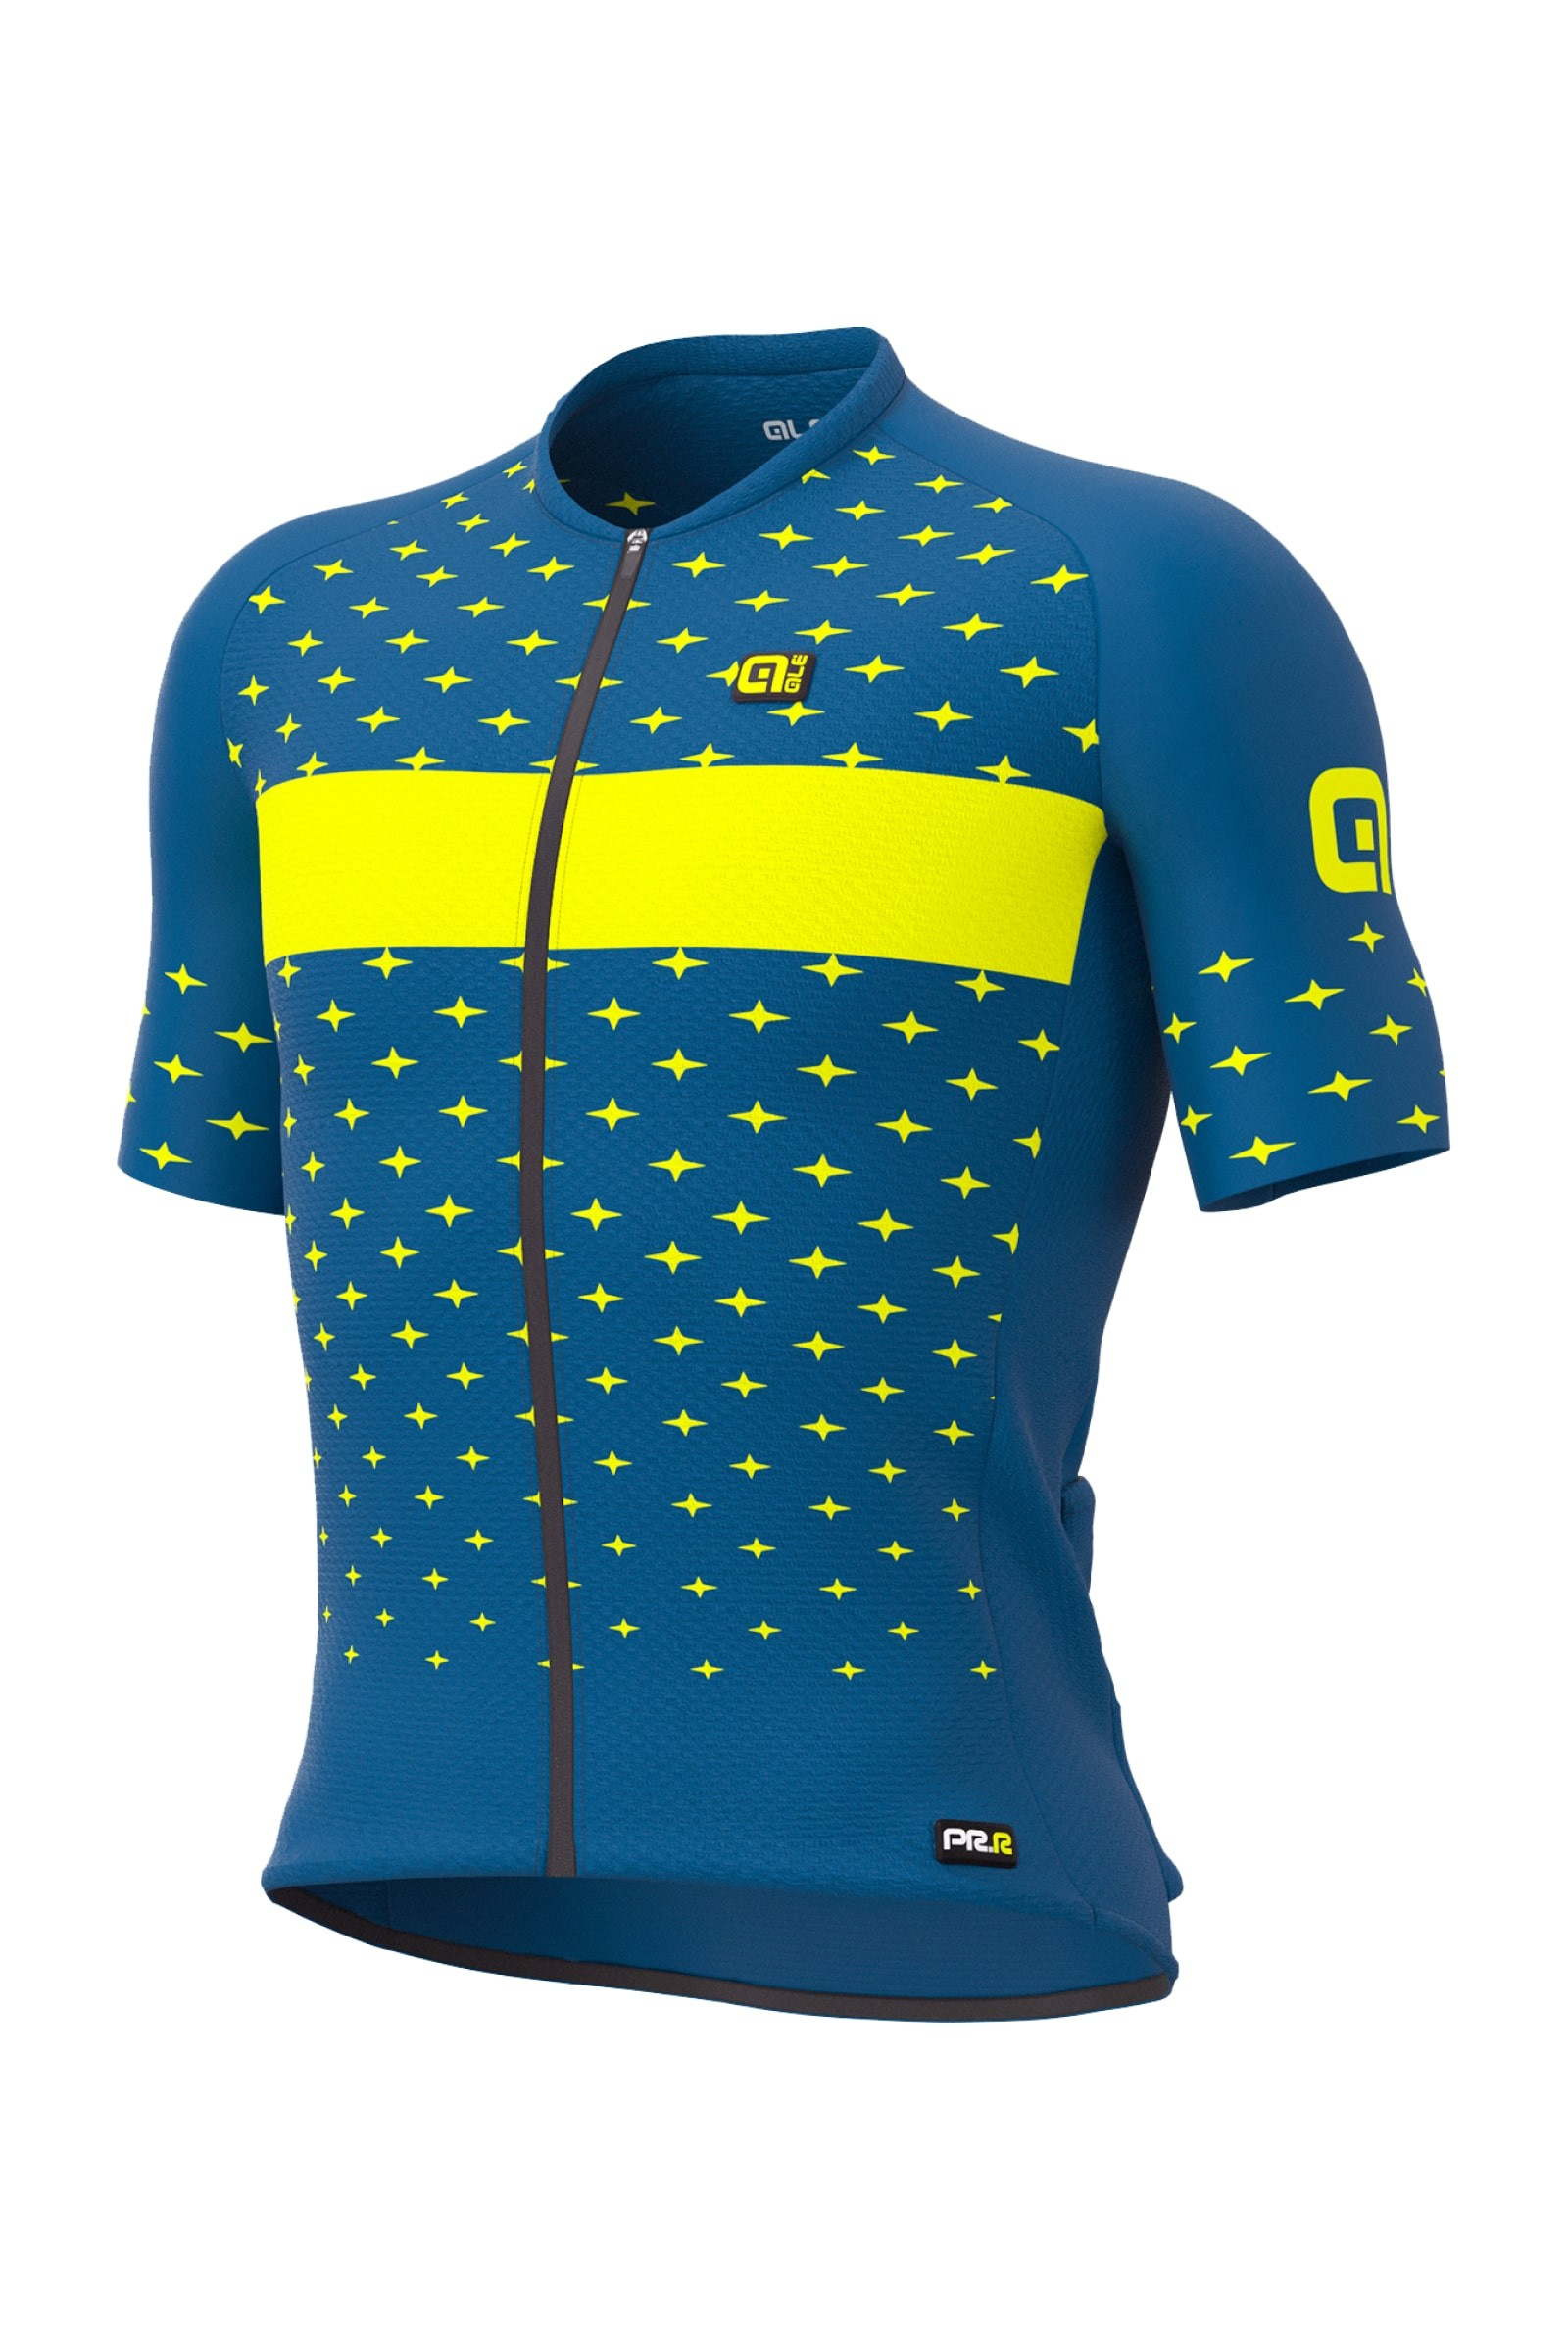 Koszulka rowerowa mêska Alé Cycling Graphics PRR Stars